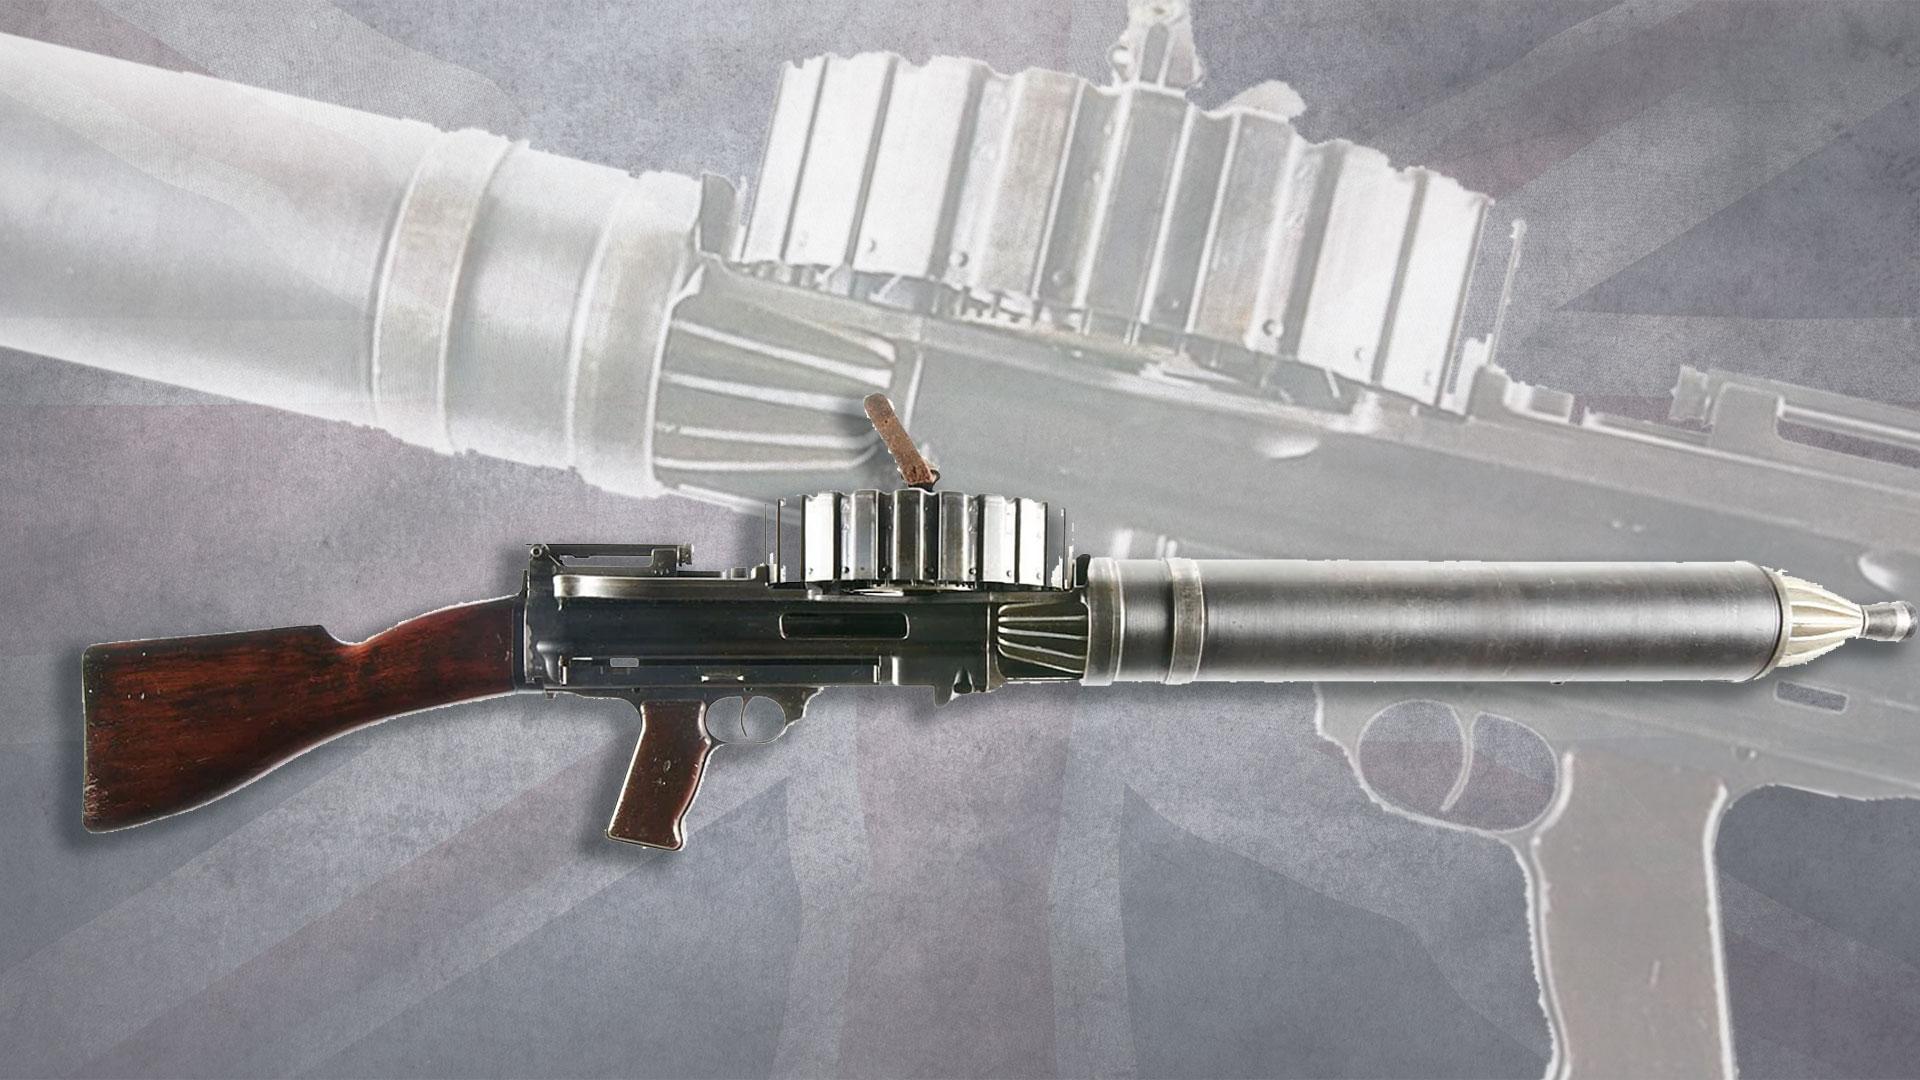 BSA-Model-1914-Lewis-Gun,-Class-III-DEWAT-Machine-Gun